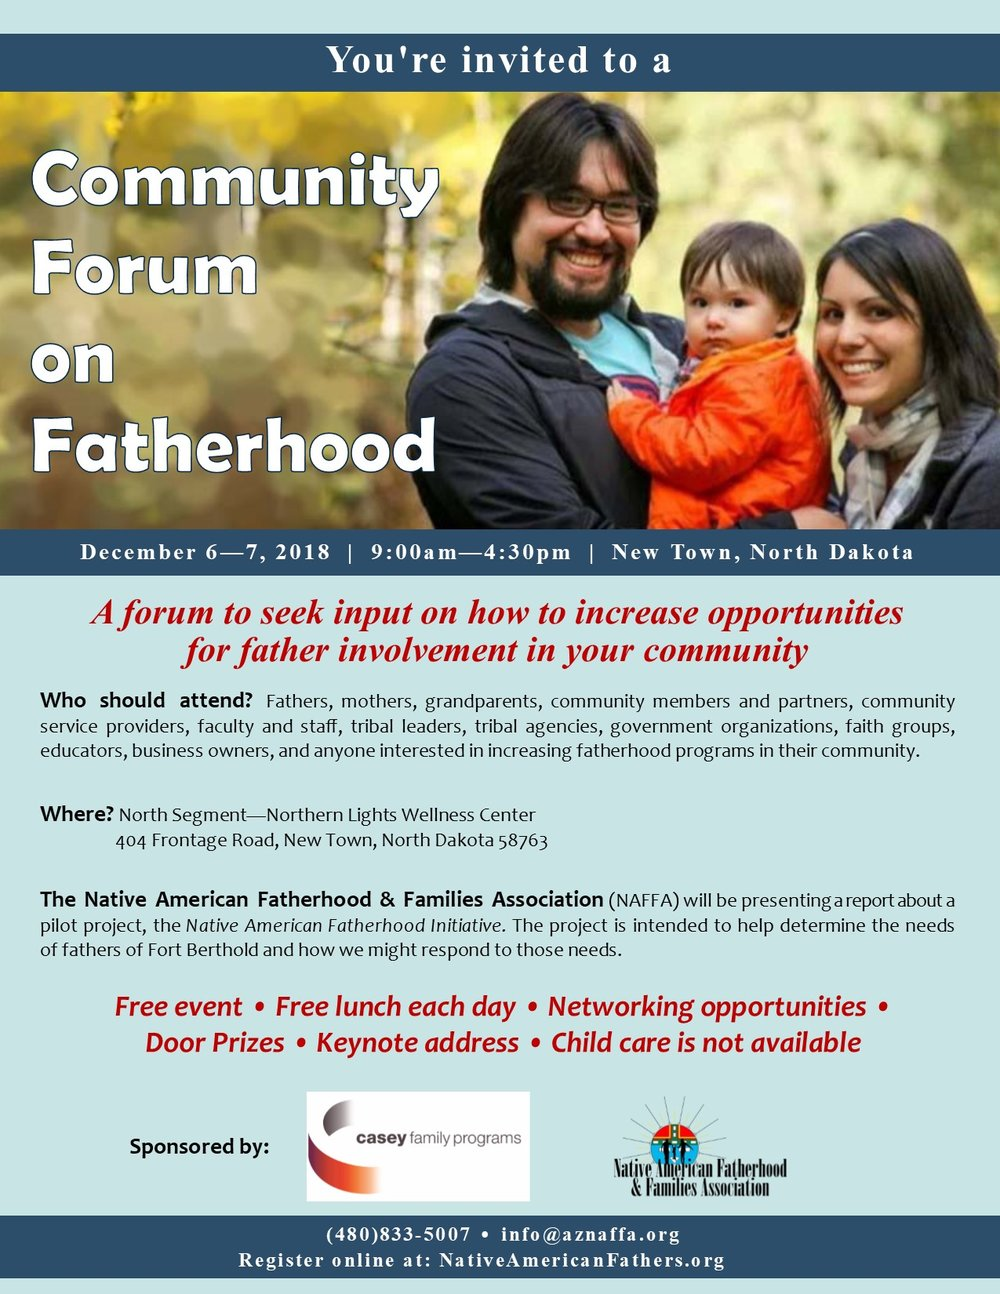 2018 Community Forum on Fatherhood Dec 6-7 2018.jpg